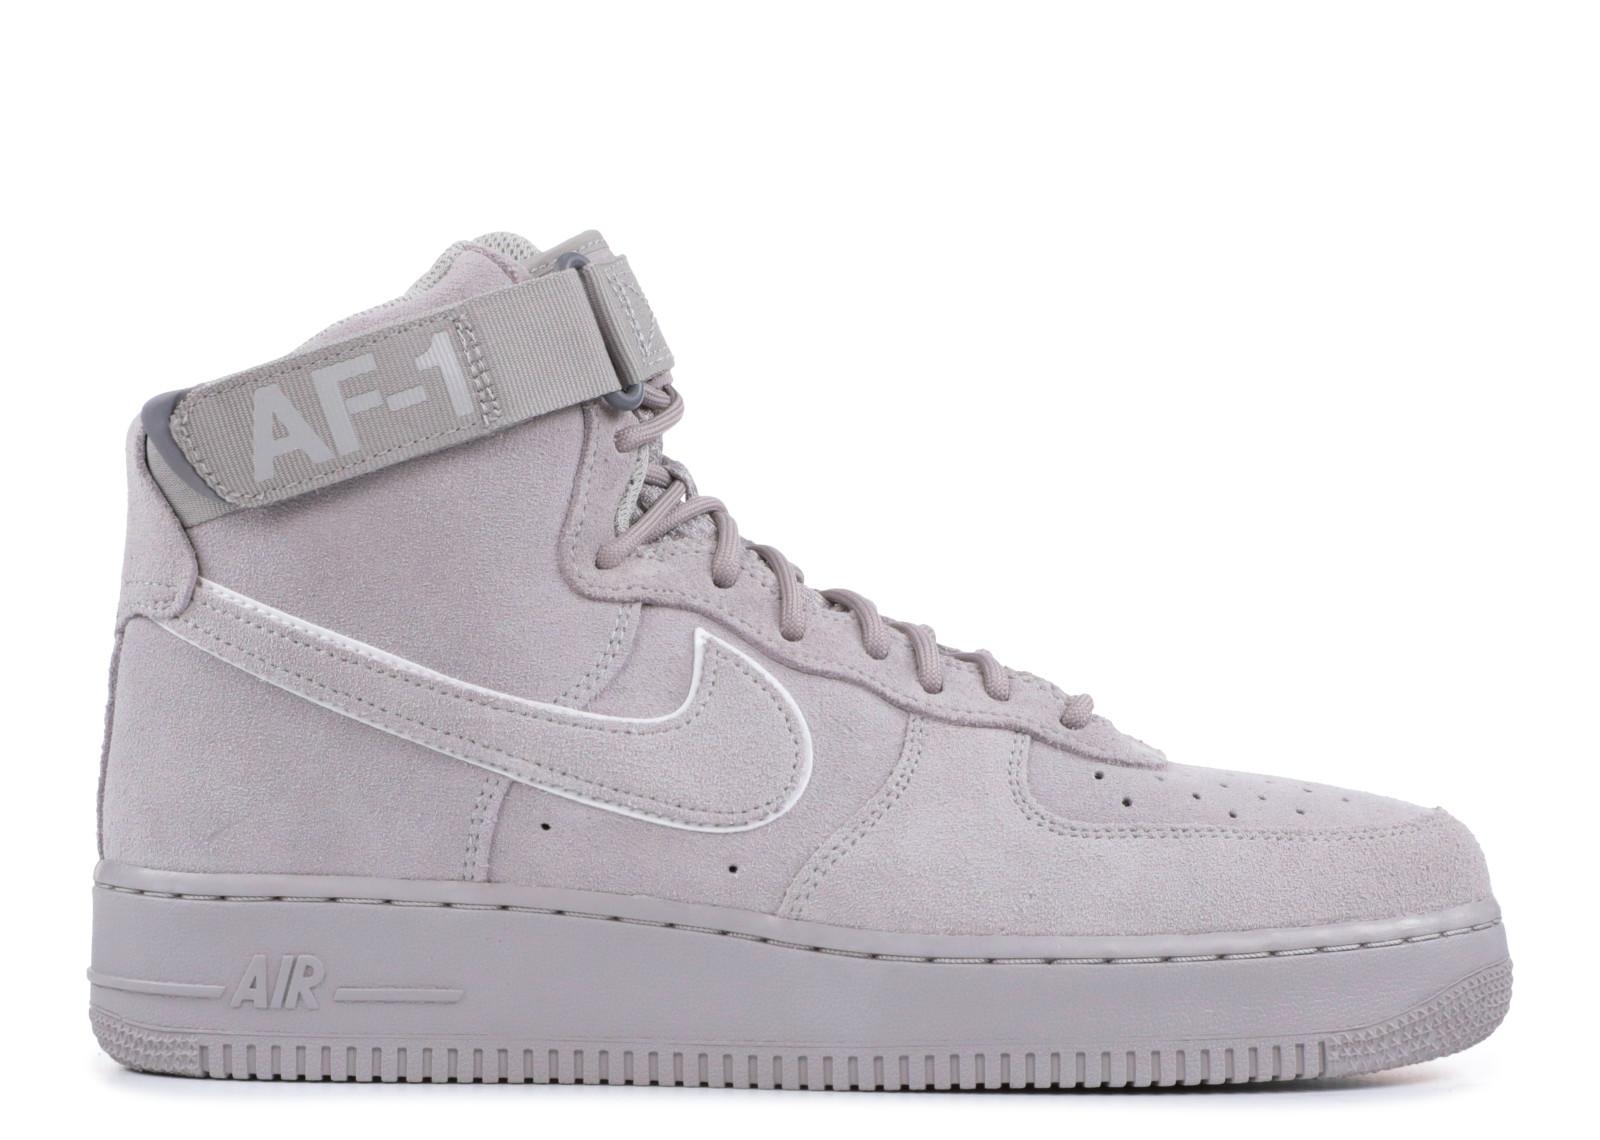 NIKE AIR FORCE 1 HIGH 07 LV8 Nike air force 1 high 07 LV8 ATMOSPHERE GREYATMOSPHERE GREY